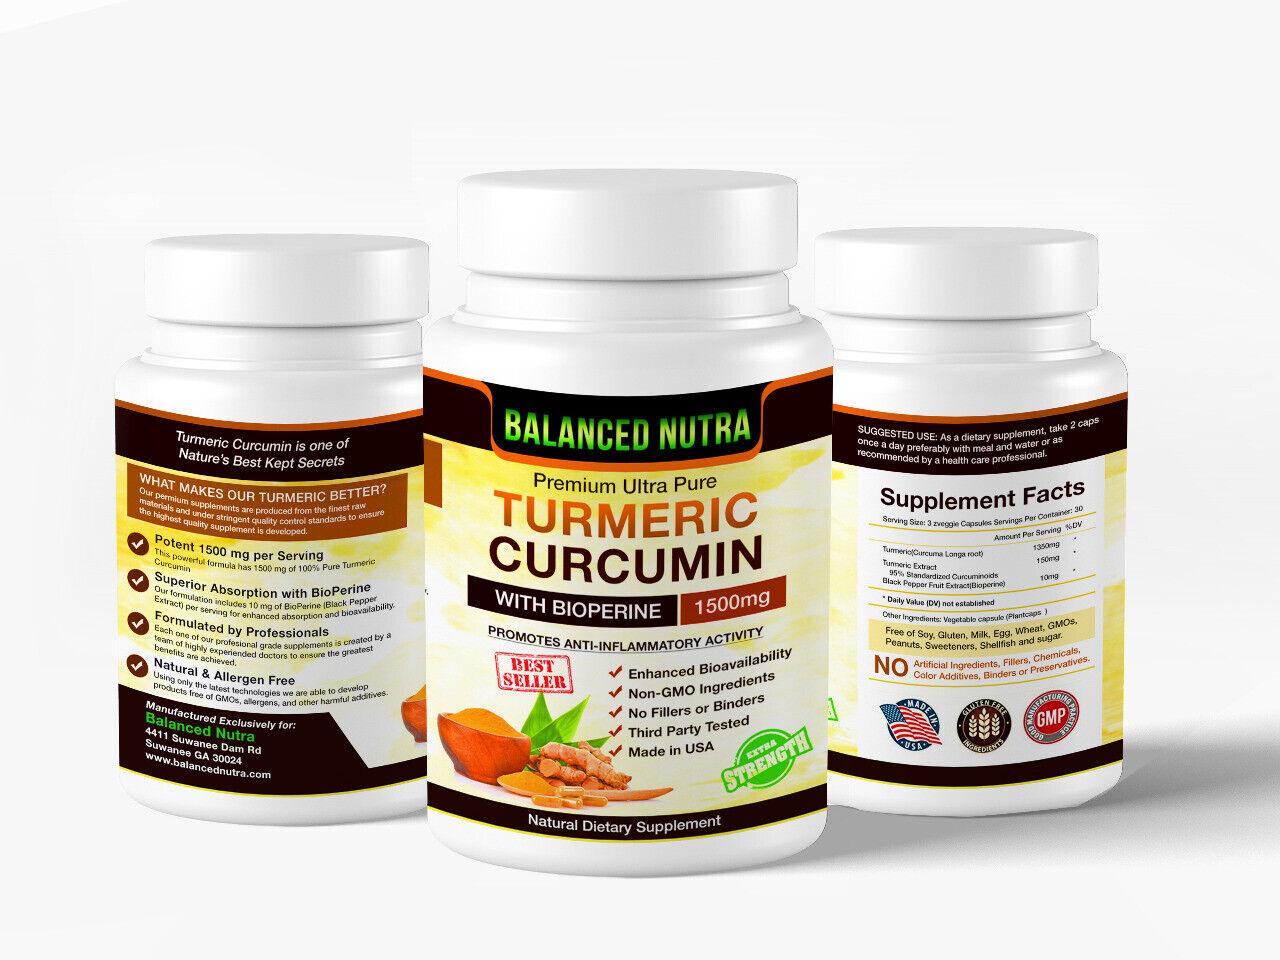 Best Selling Turmeric Curcumin with Bioperine Black Pepper 1500mg Extra Strength 5